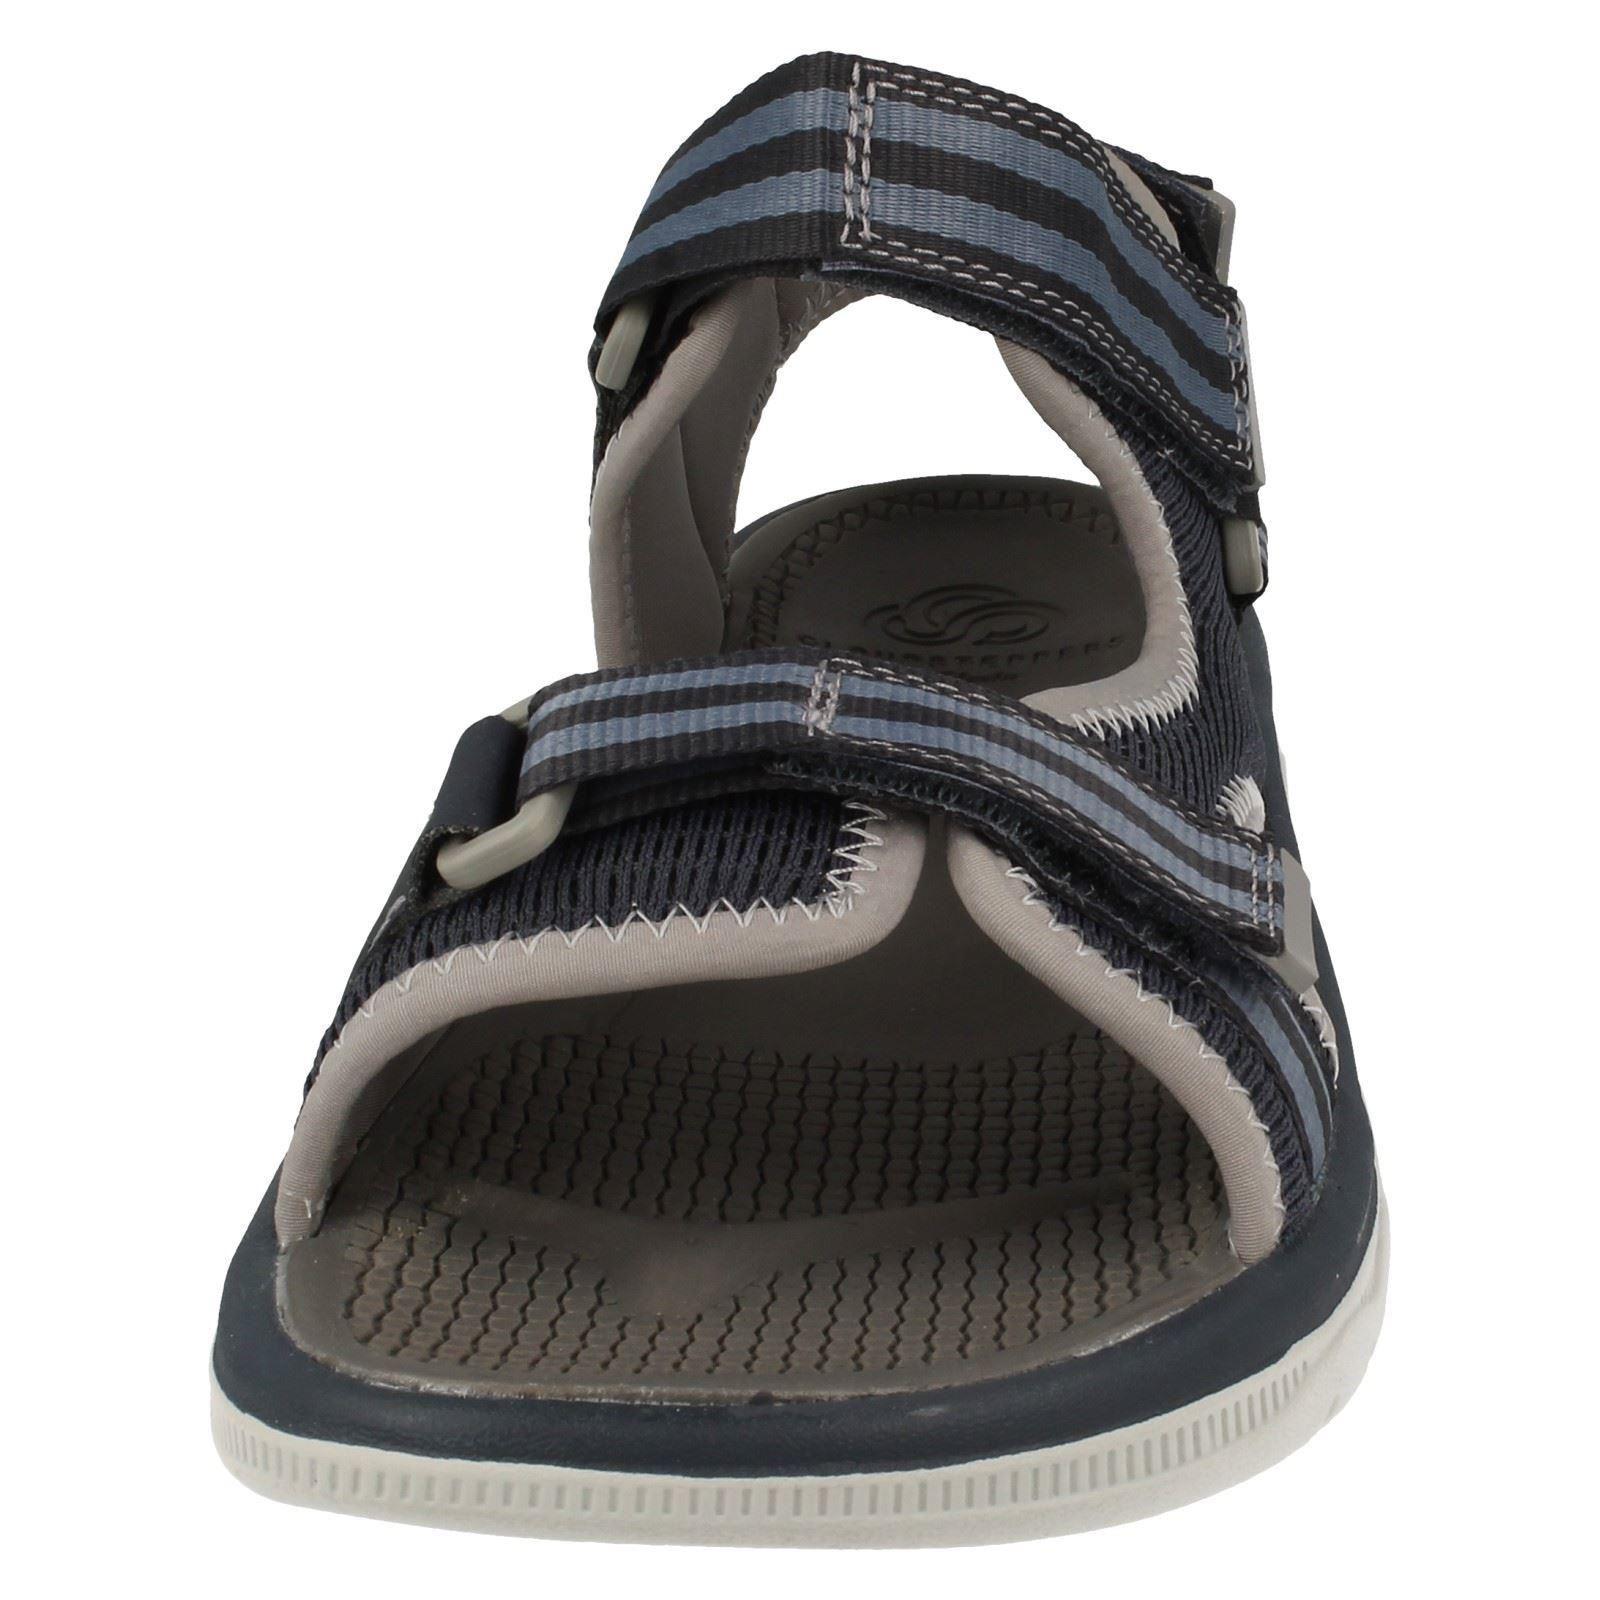 BALTA SKY  Herren CLARKS BEACH RIPTAPE CASUAL OPEN TOE BEACH CLARKS Schuhe STRAPPED SANDALS SIZE b57c24